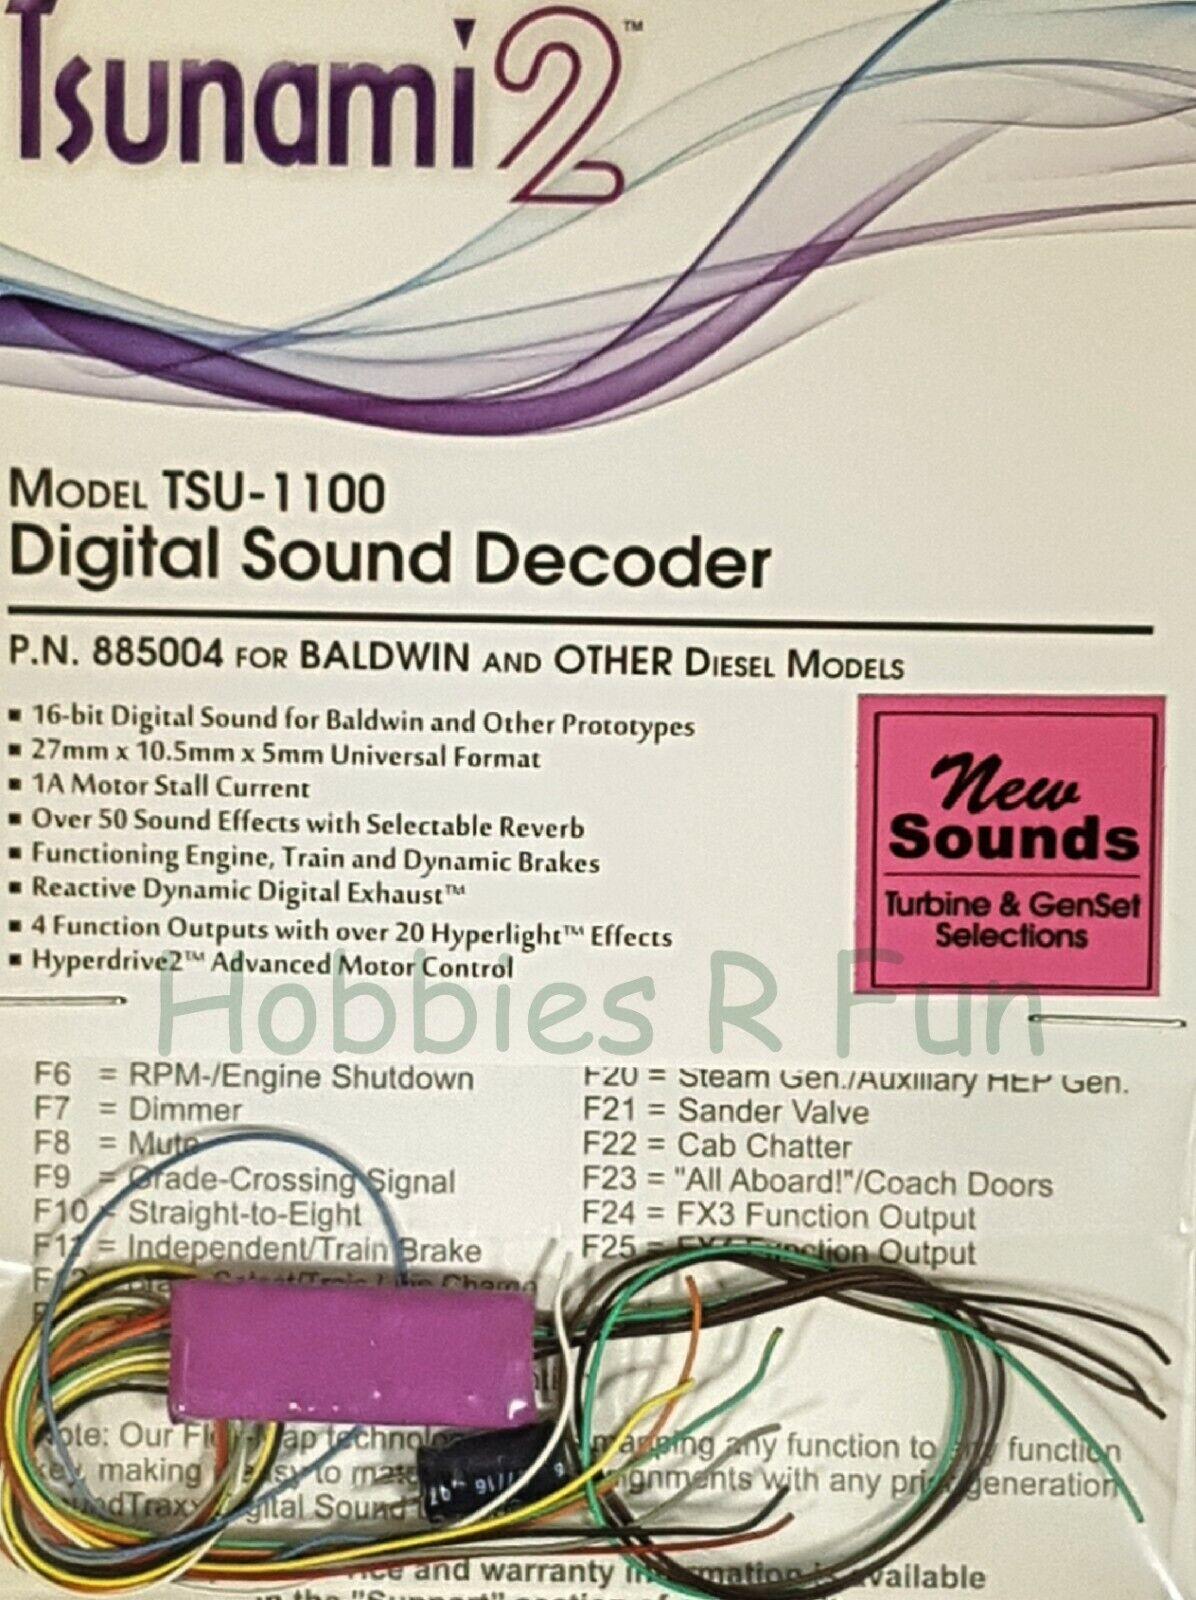 DCC decoder suonotraxx TSU1100 Tsunami2 Digital suono for Baldwin & Other locos